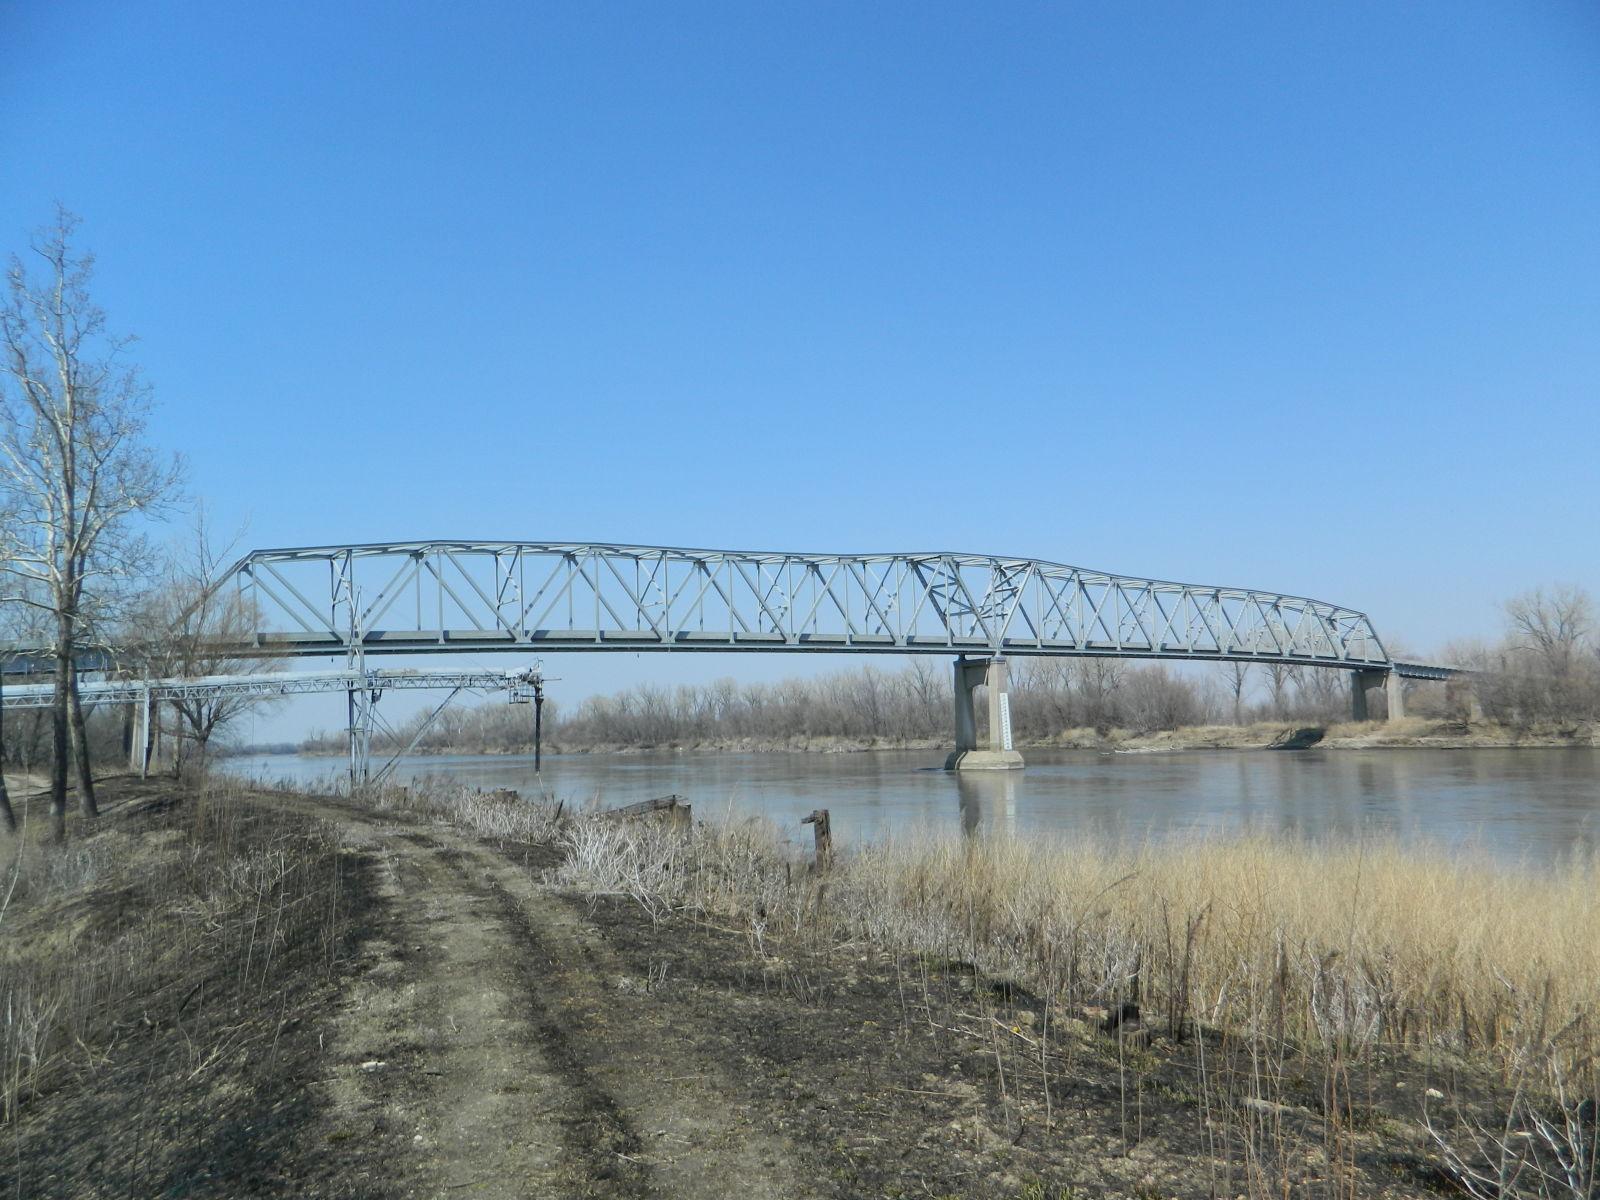 Brownville (Nemaha County, Nebraska)